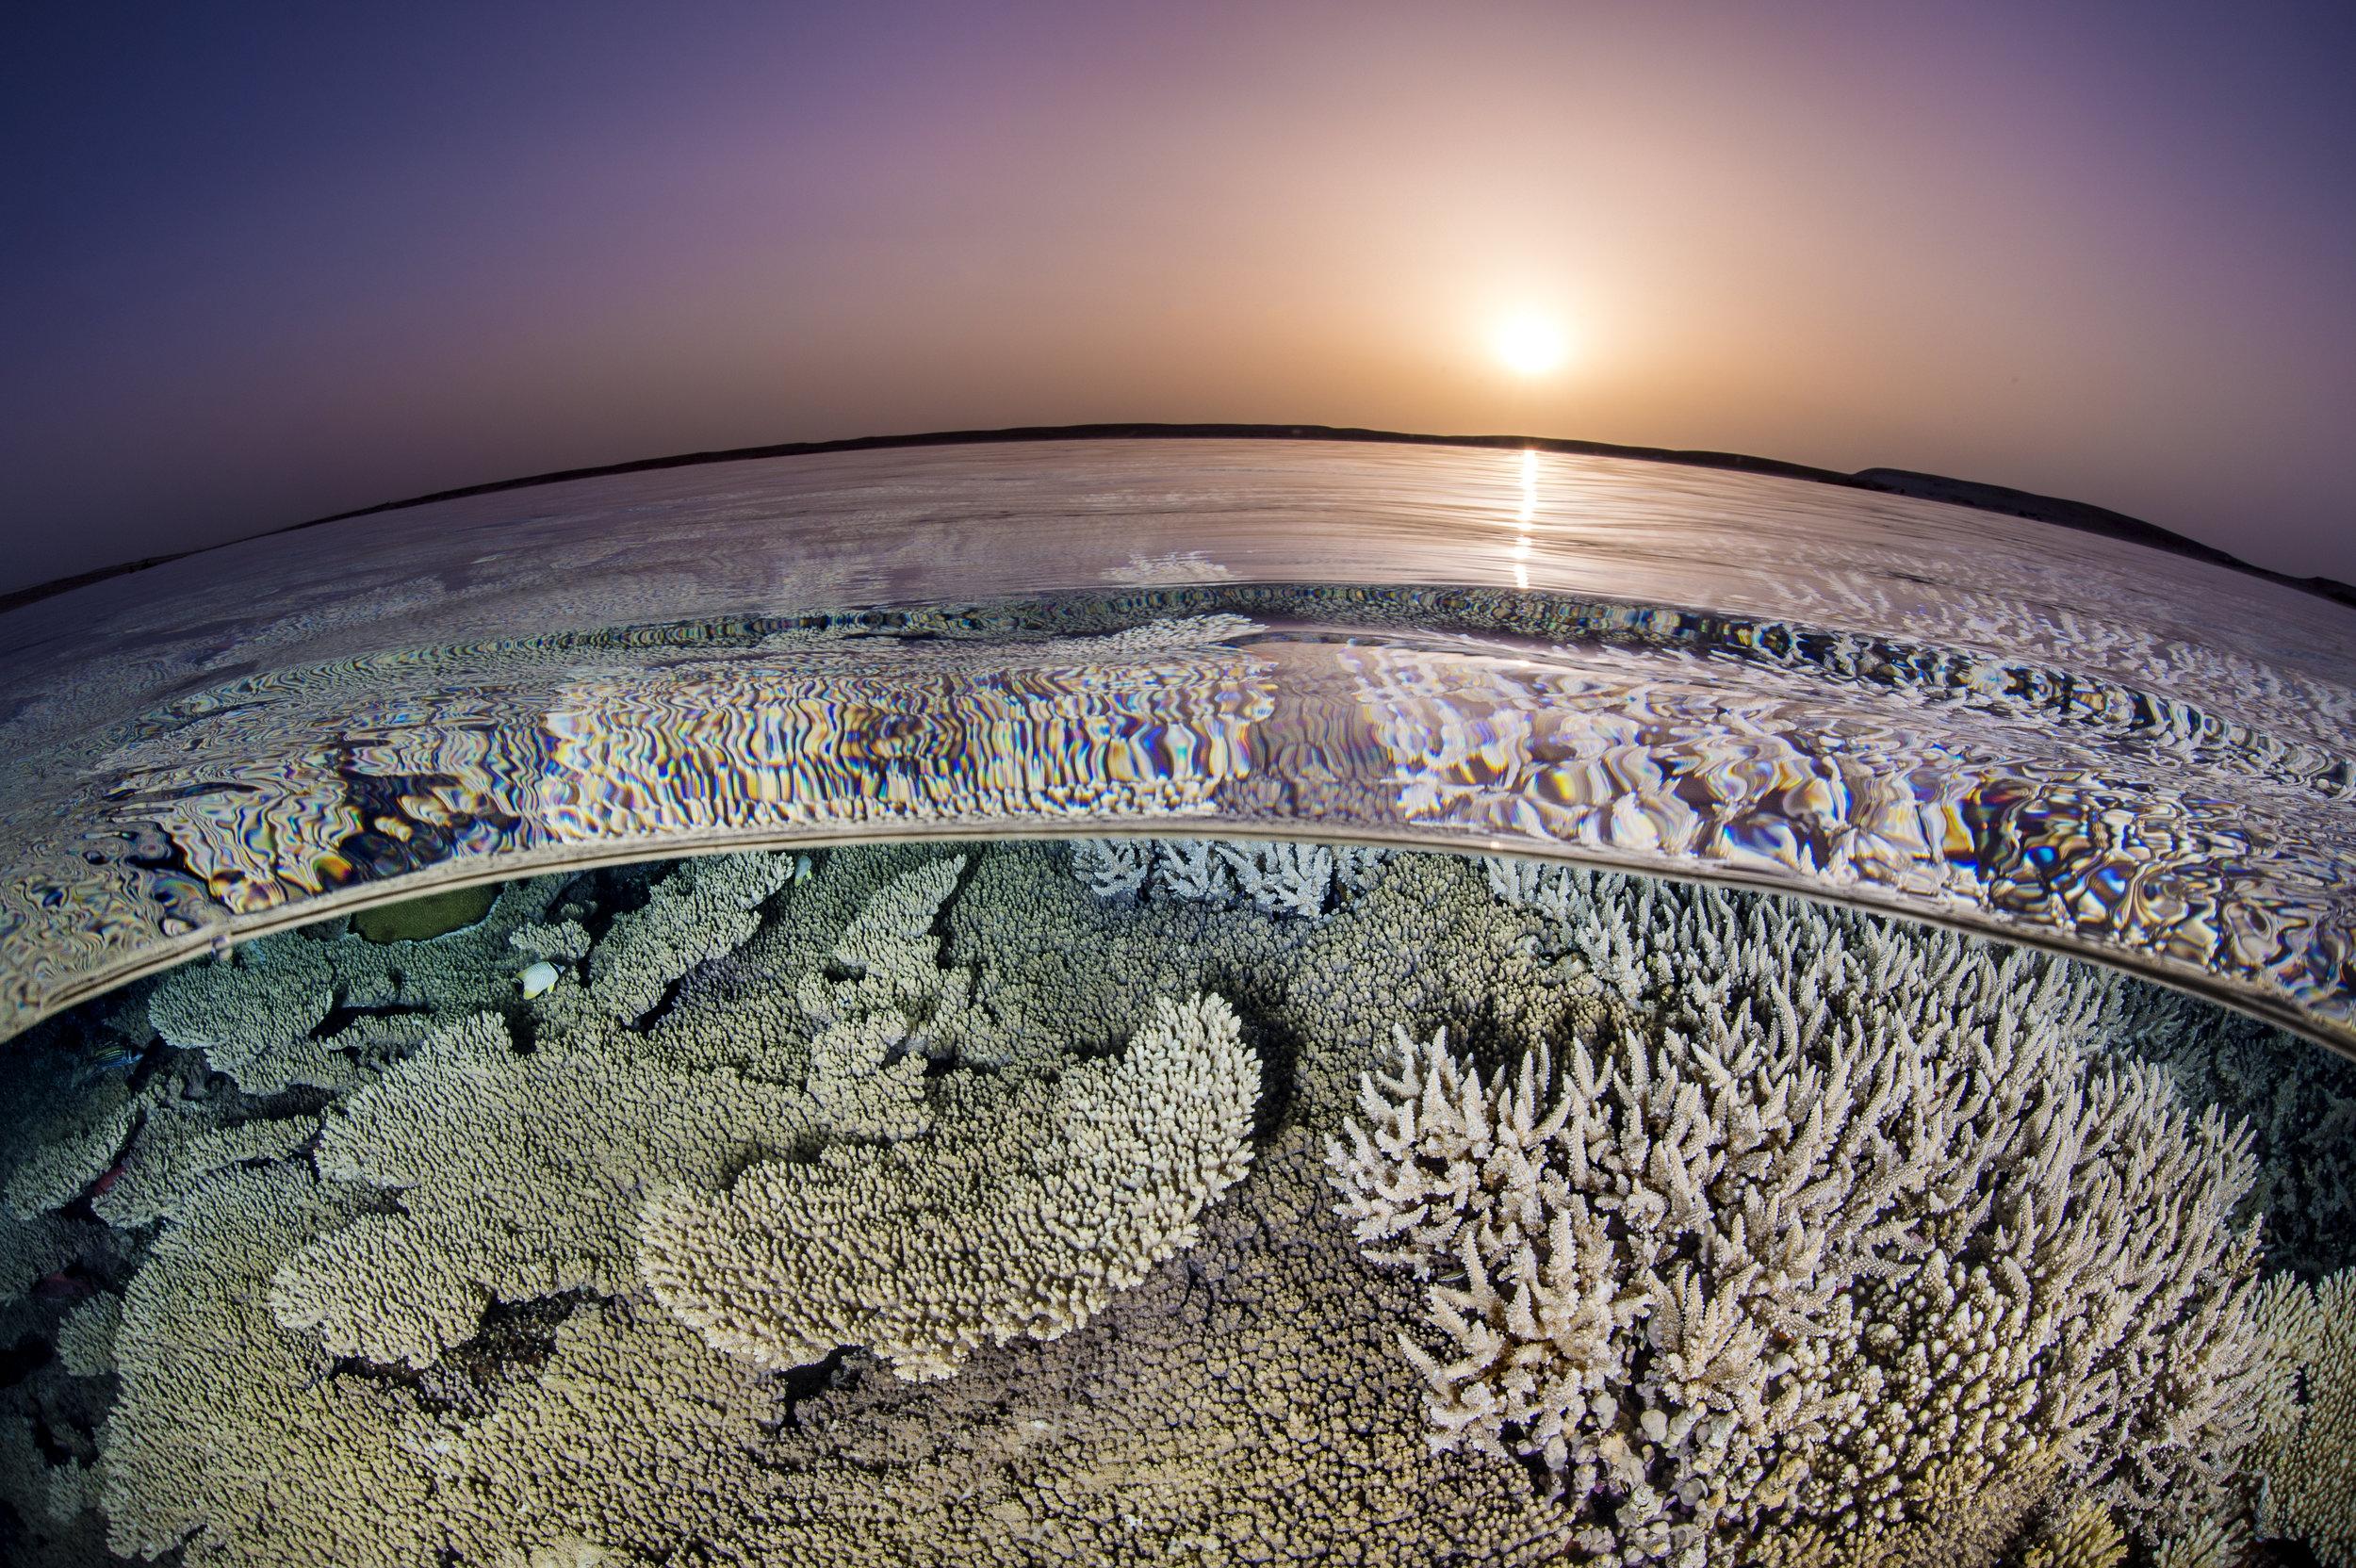 09 - a reef in GUBAL ISLAND, EGYPT credit: alex mustard / coral reef image bank